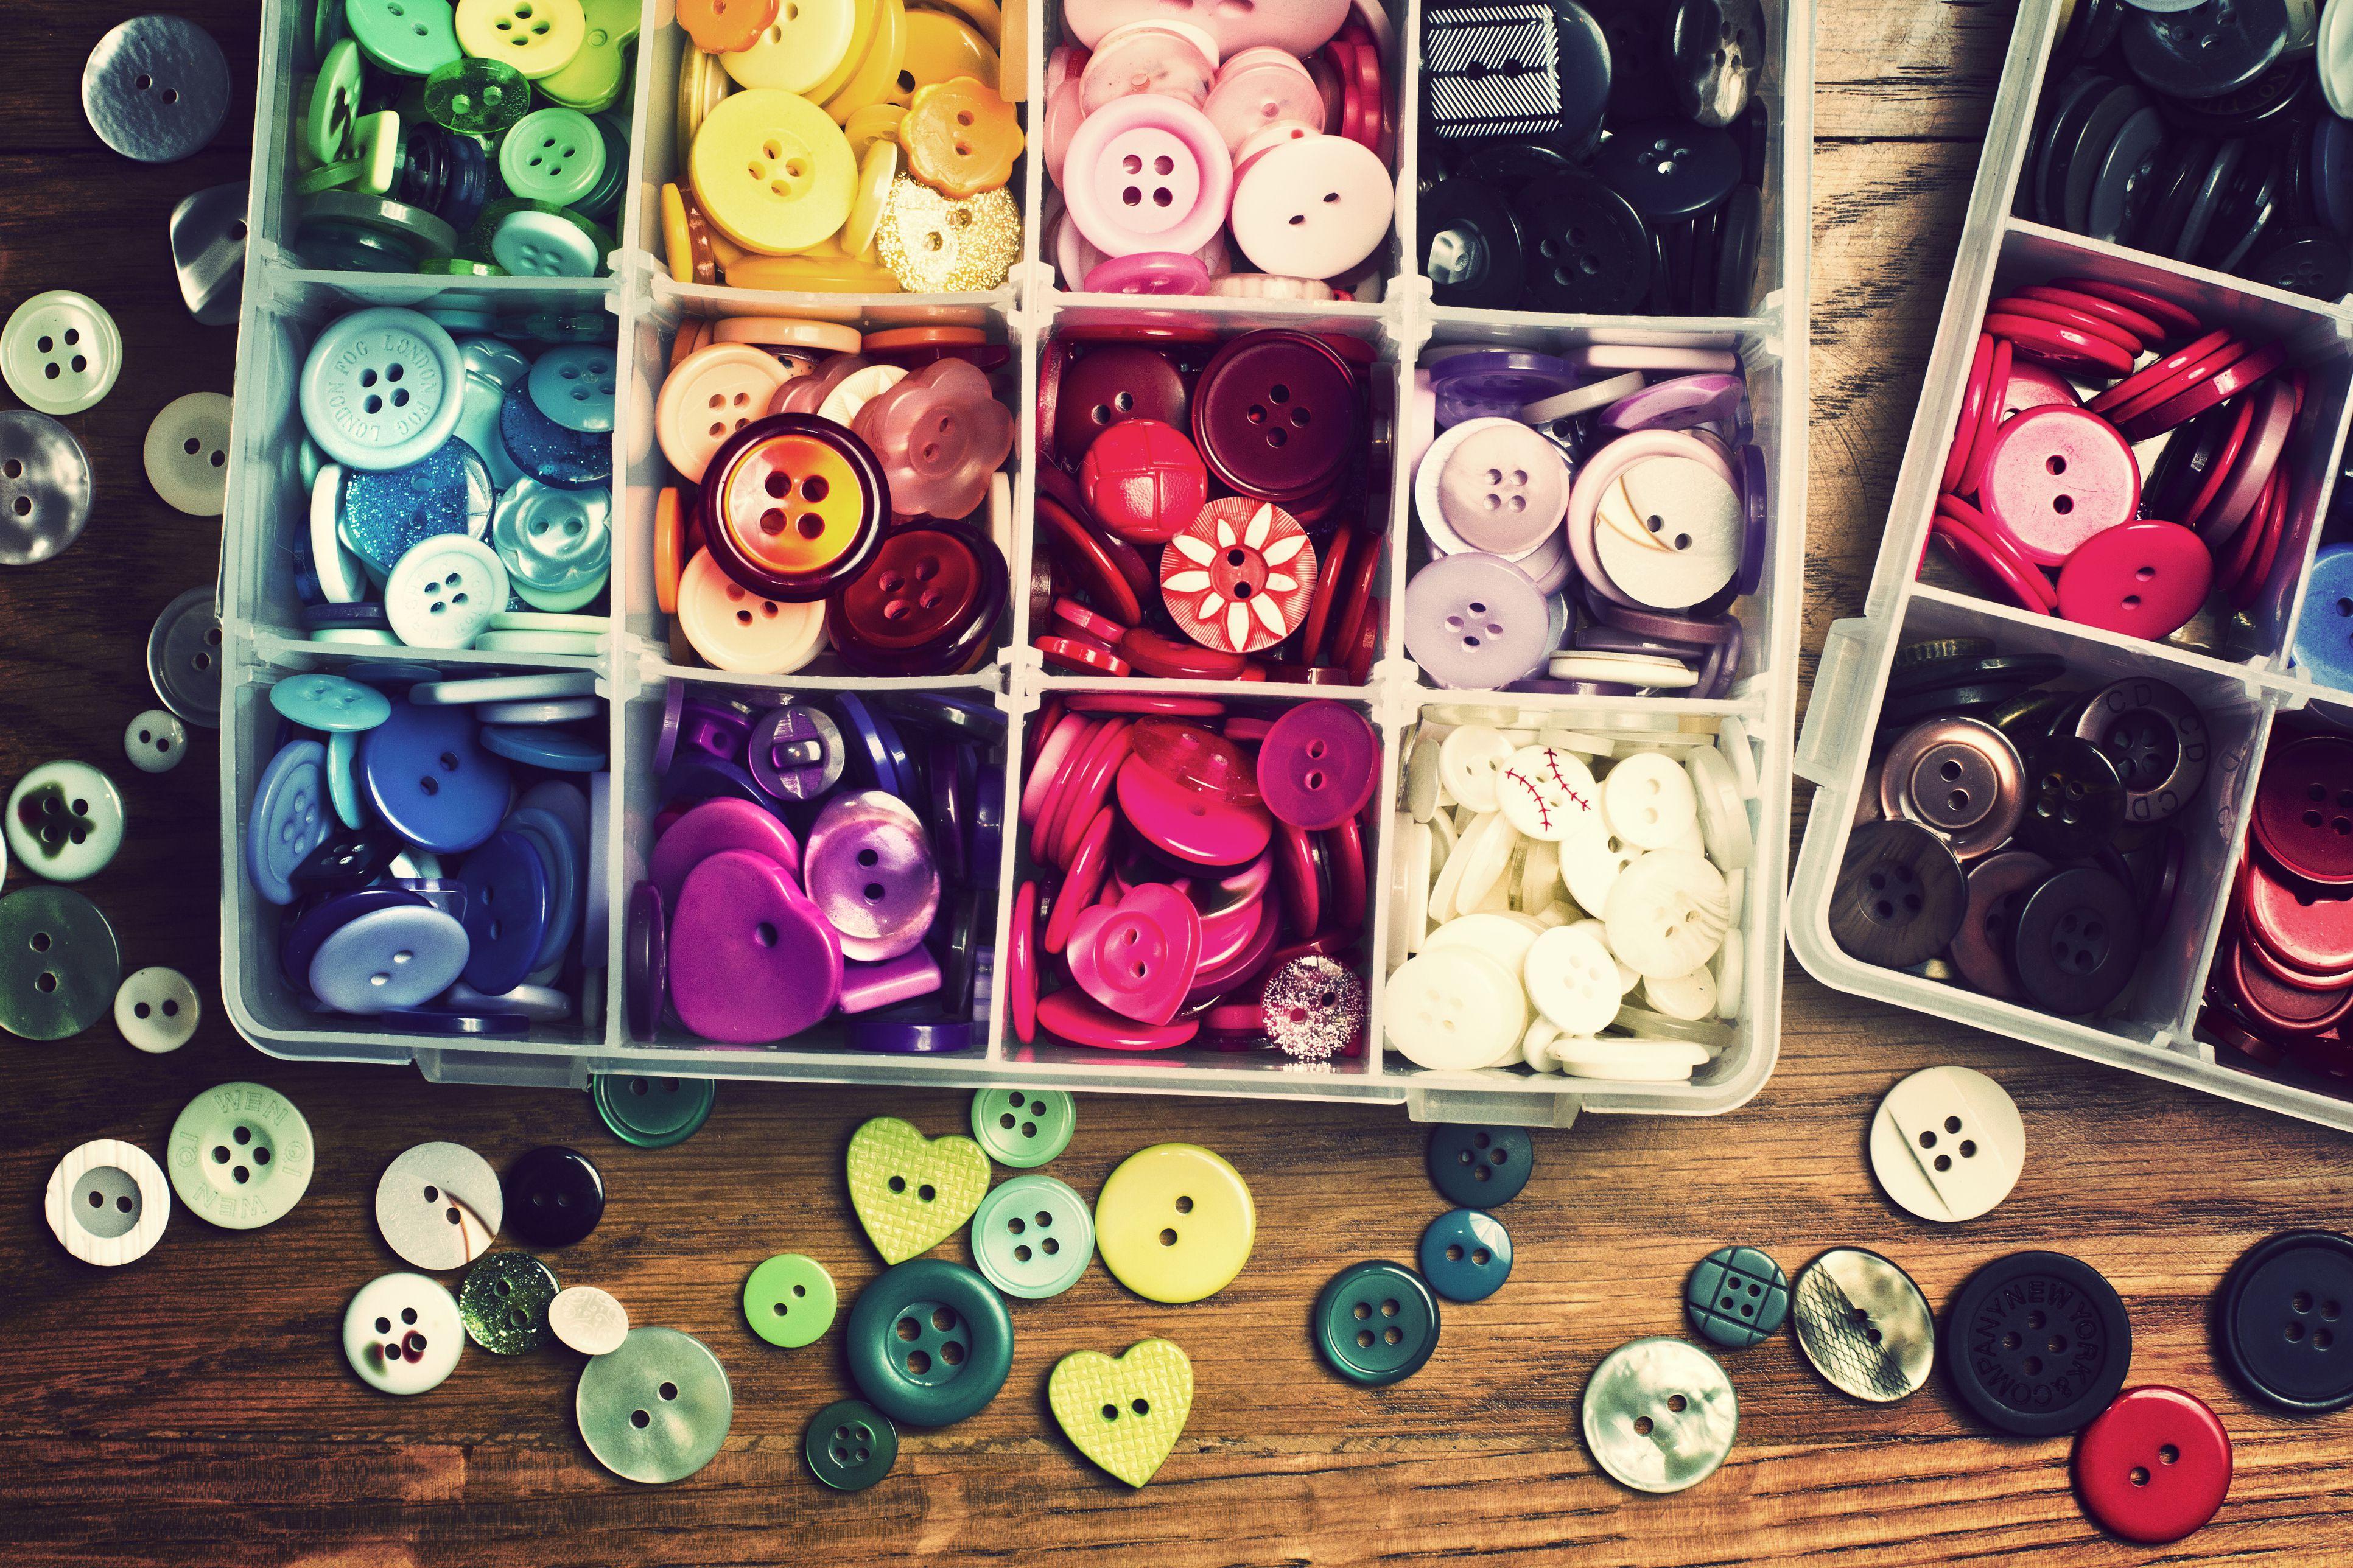 Understanding The Fear Of Buttons